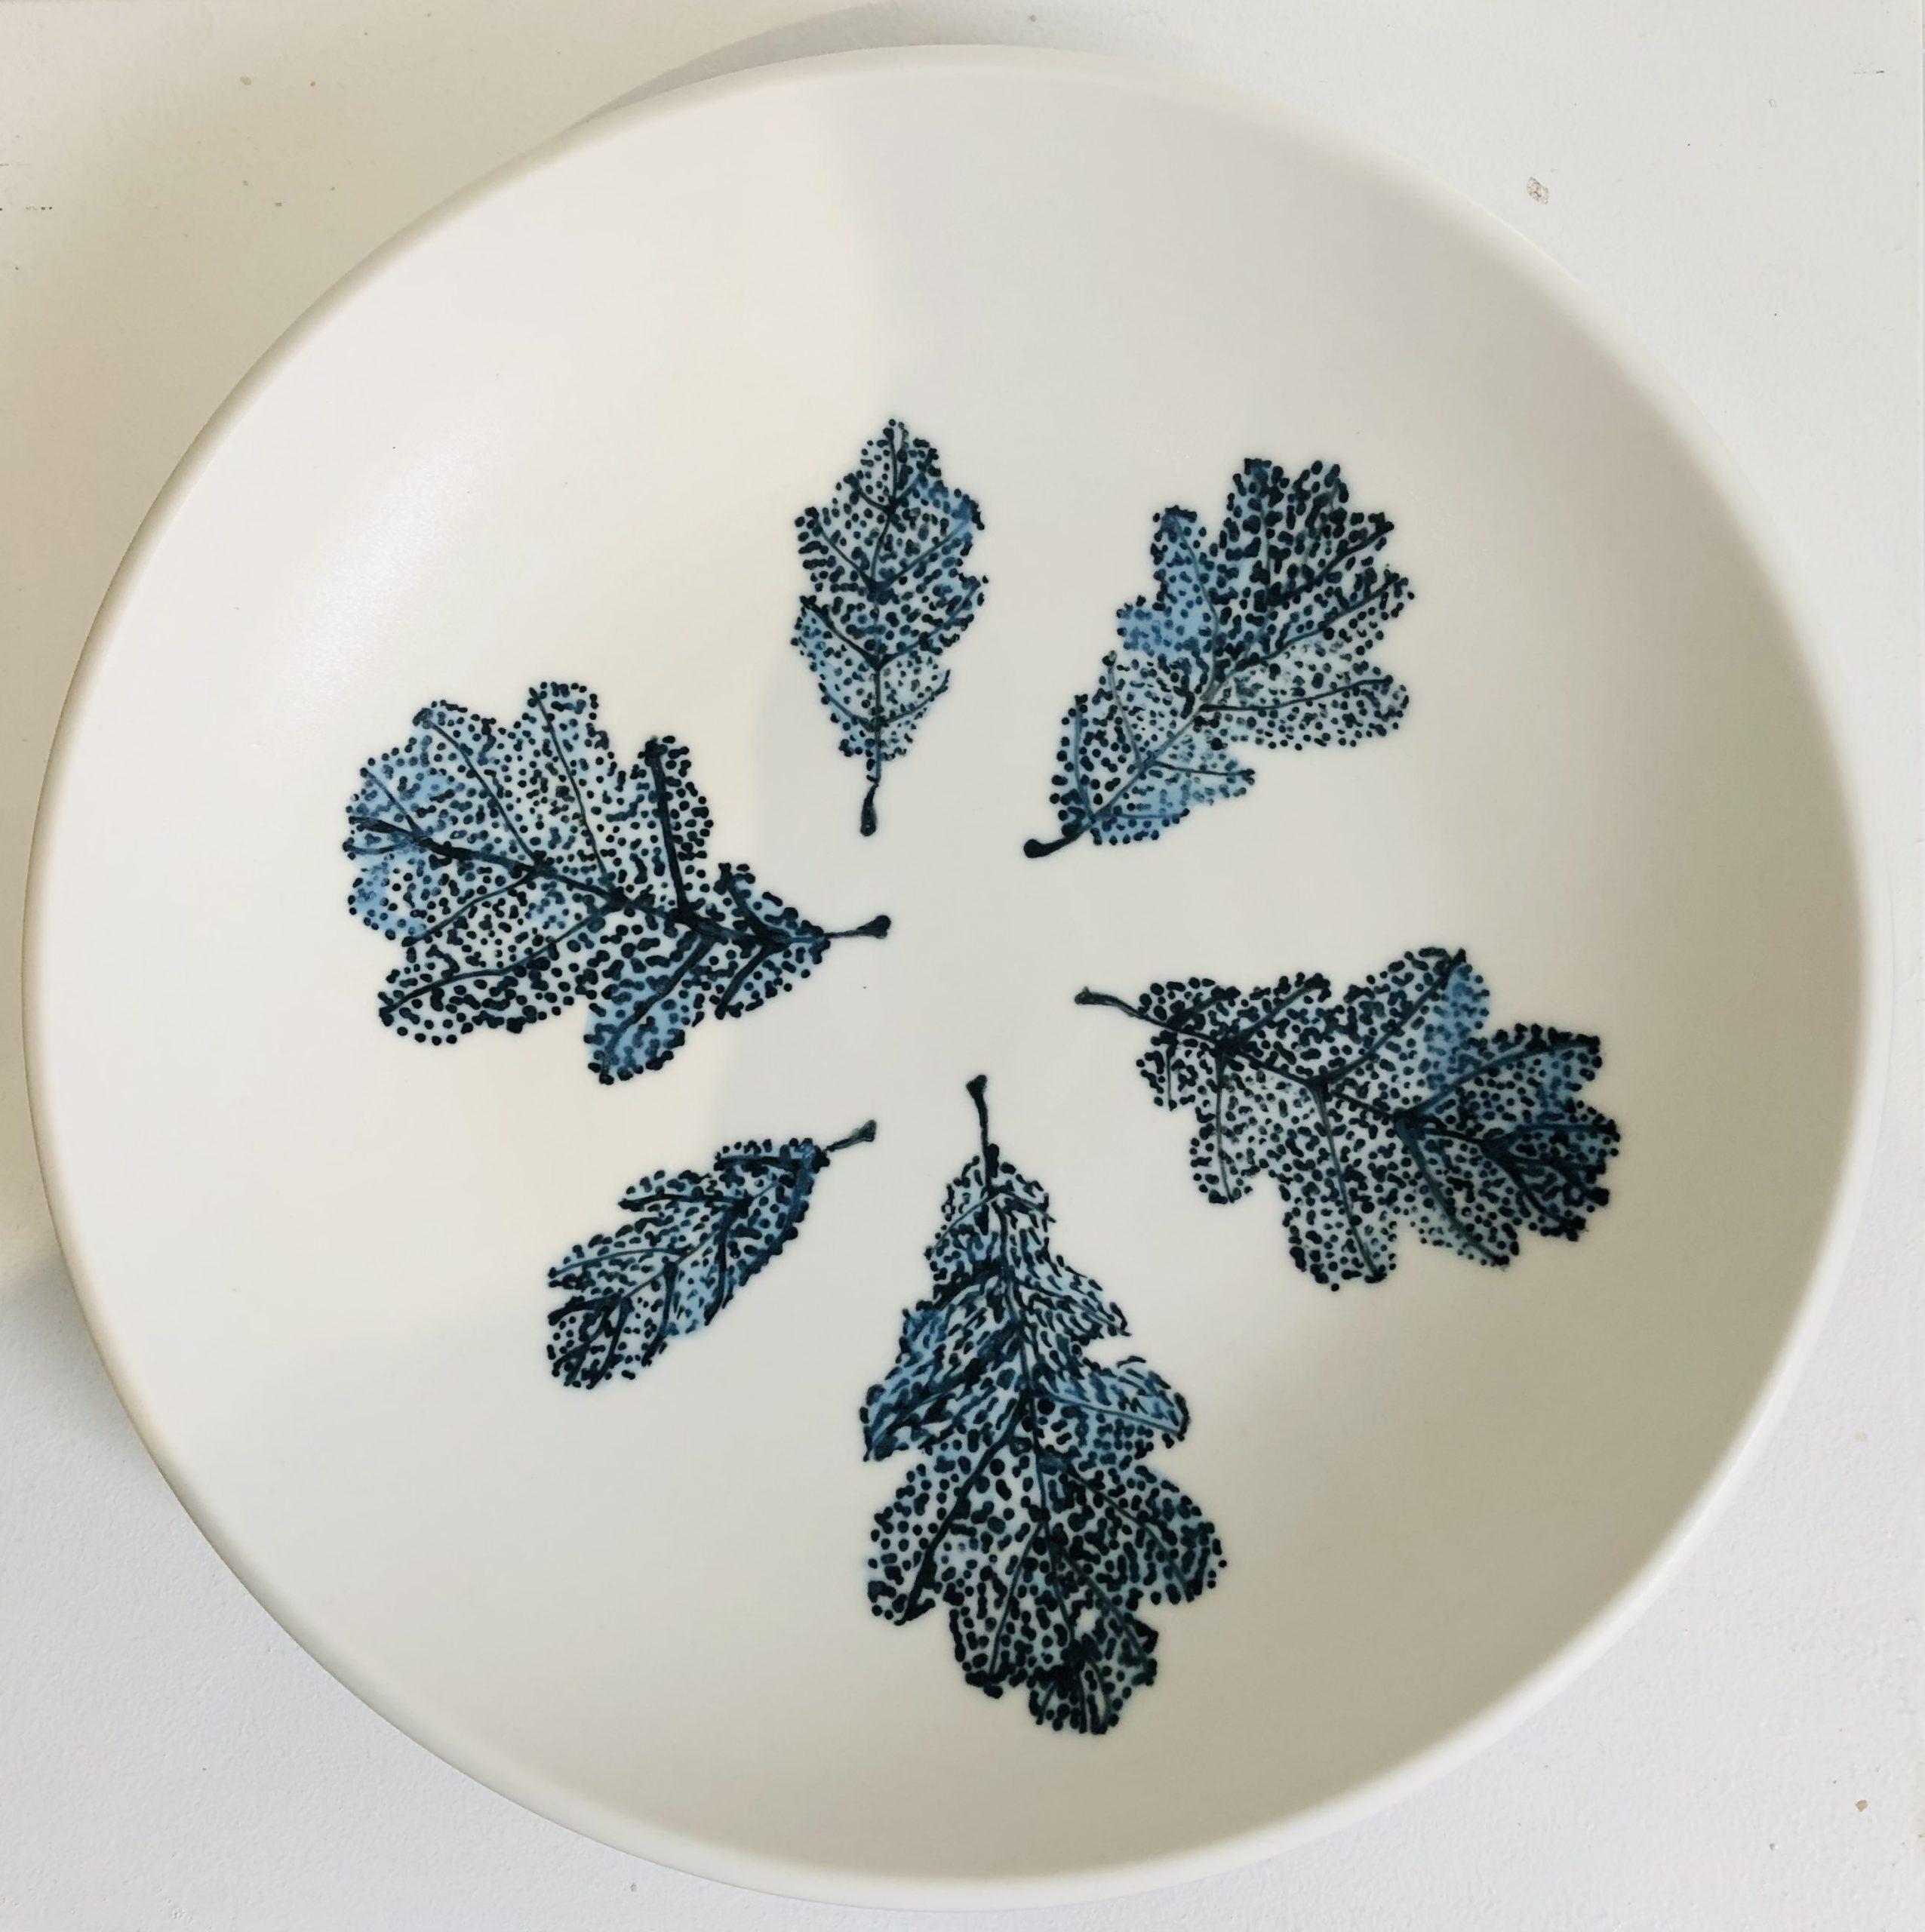 Large Porcelain Bowl with Blue Oak Leaves byPhilippa de Burlet